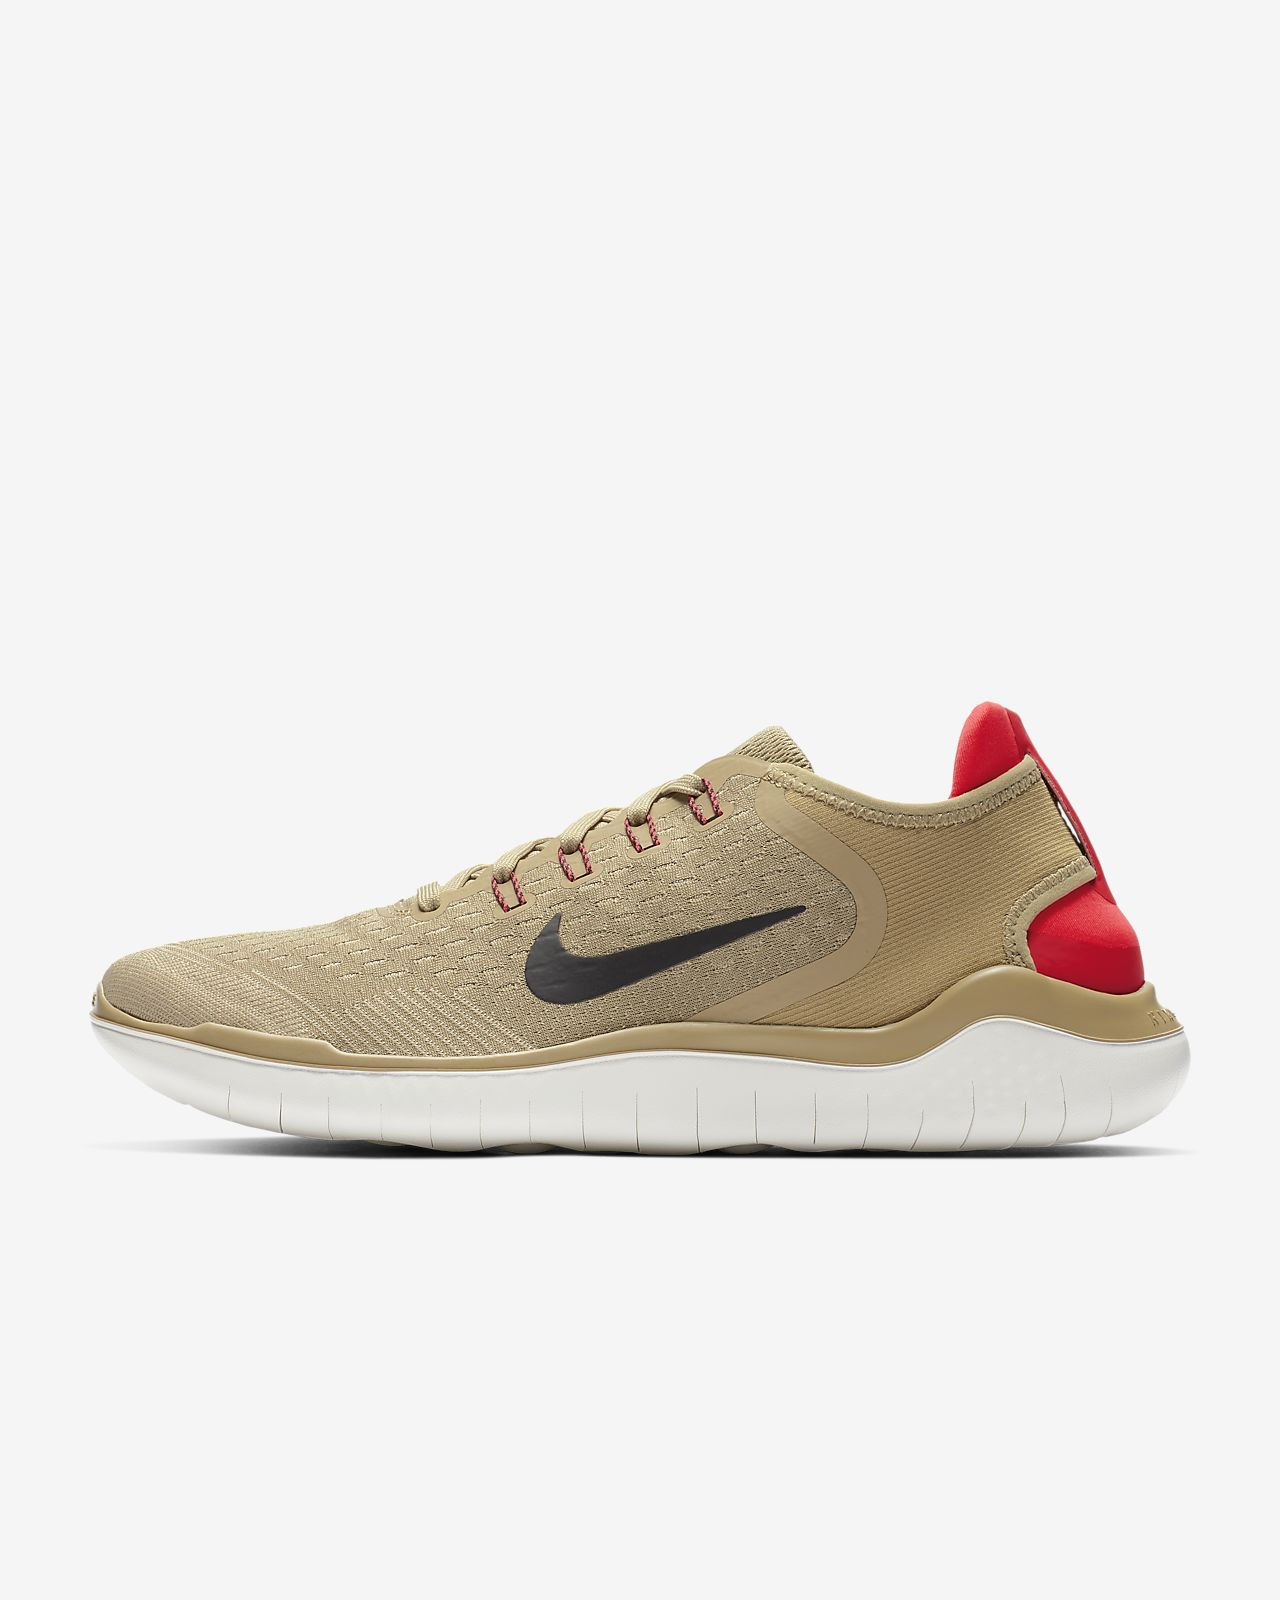 the best attitude 8d6e6 756fc Scarpa da running Nike Free RN 2018 - Uomo